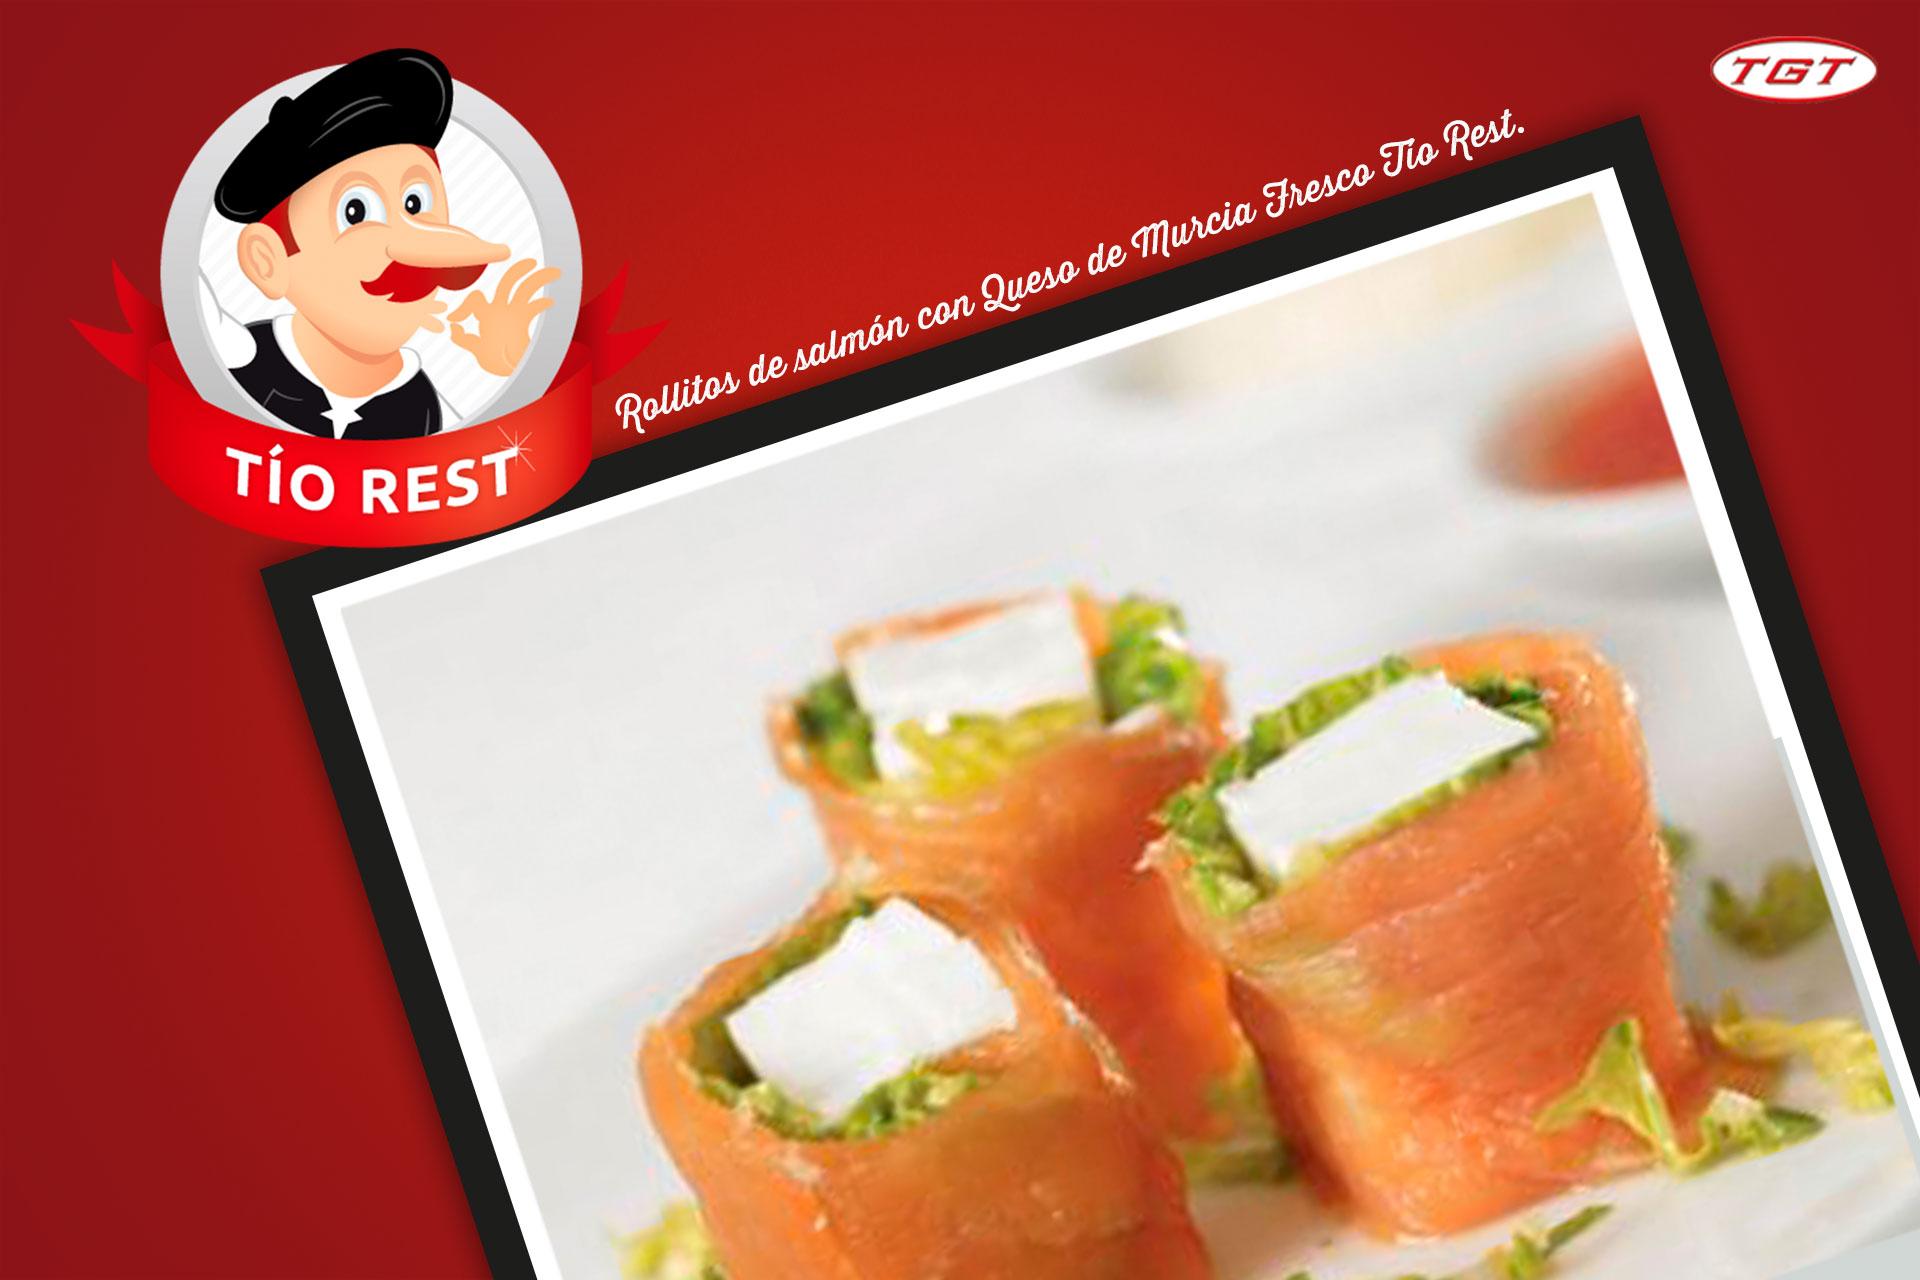 rollito-de-salmon-con-queso-fresco-de-murcia-tio-rest